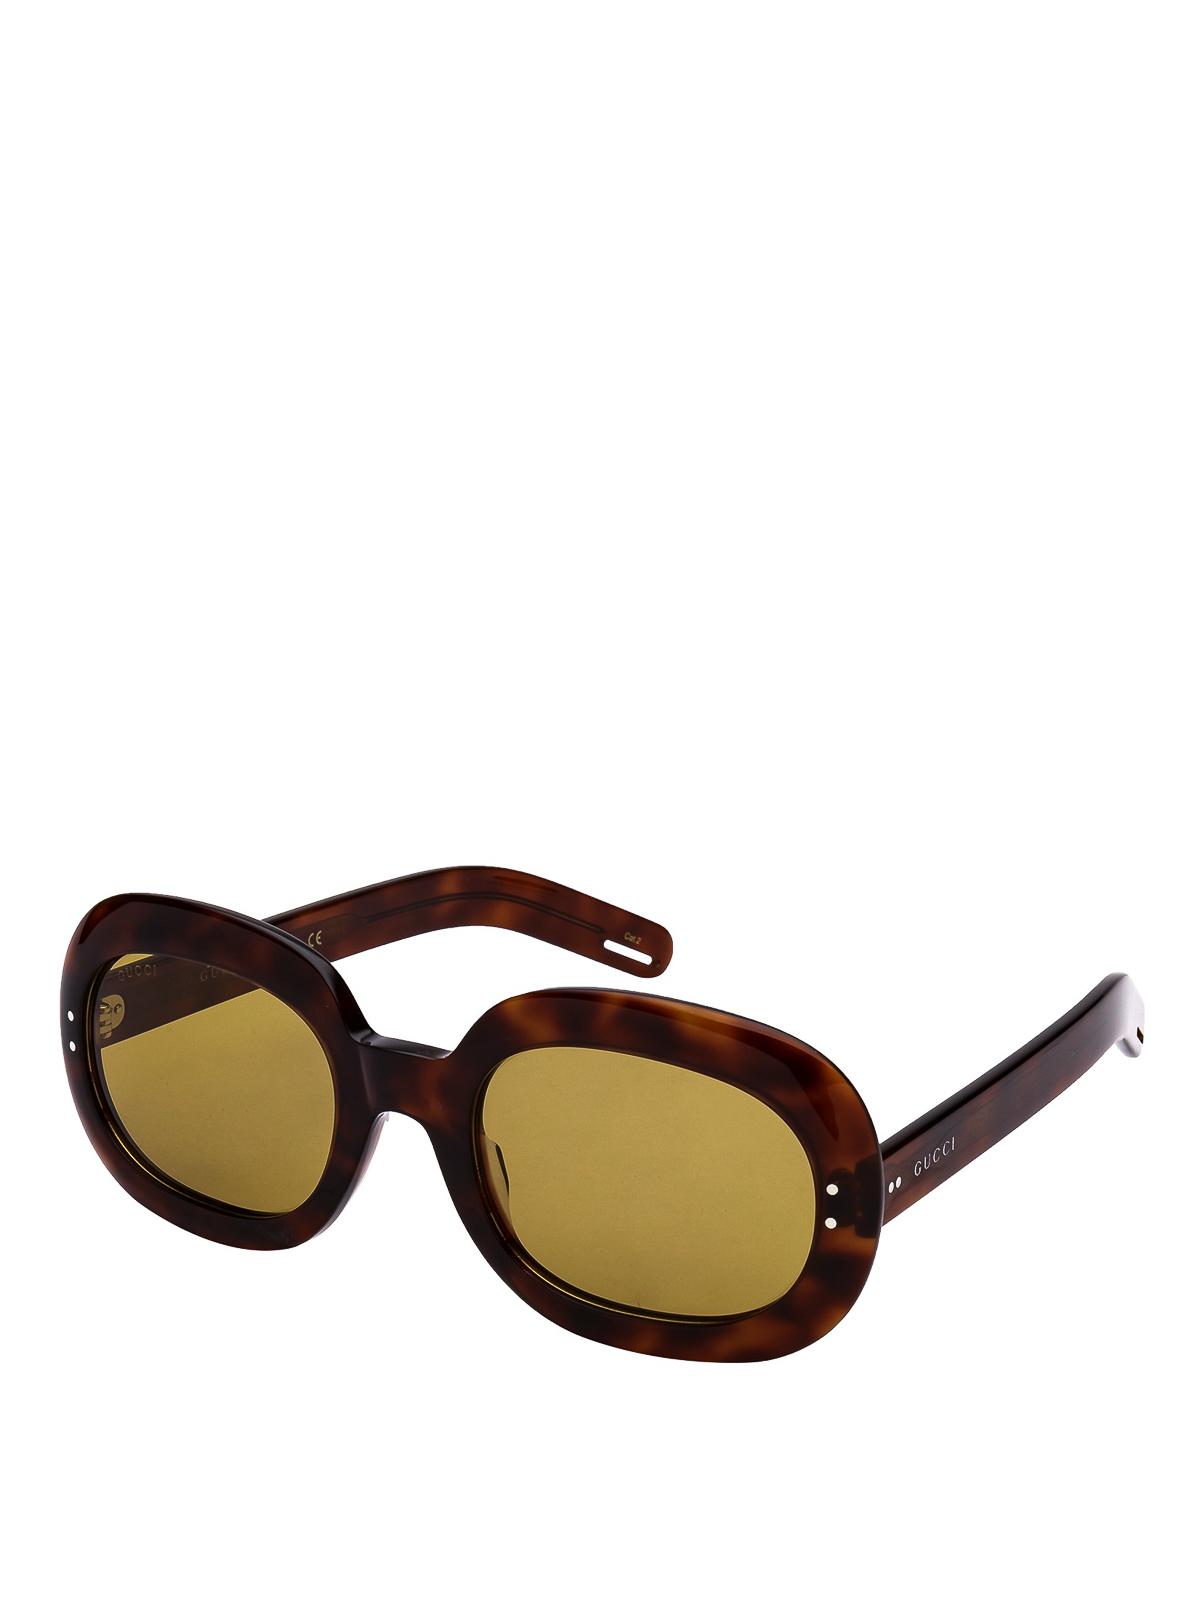 Gucci Tortoise Round Sunglasses In Dark Brown